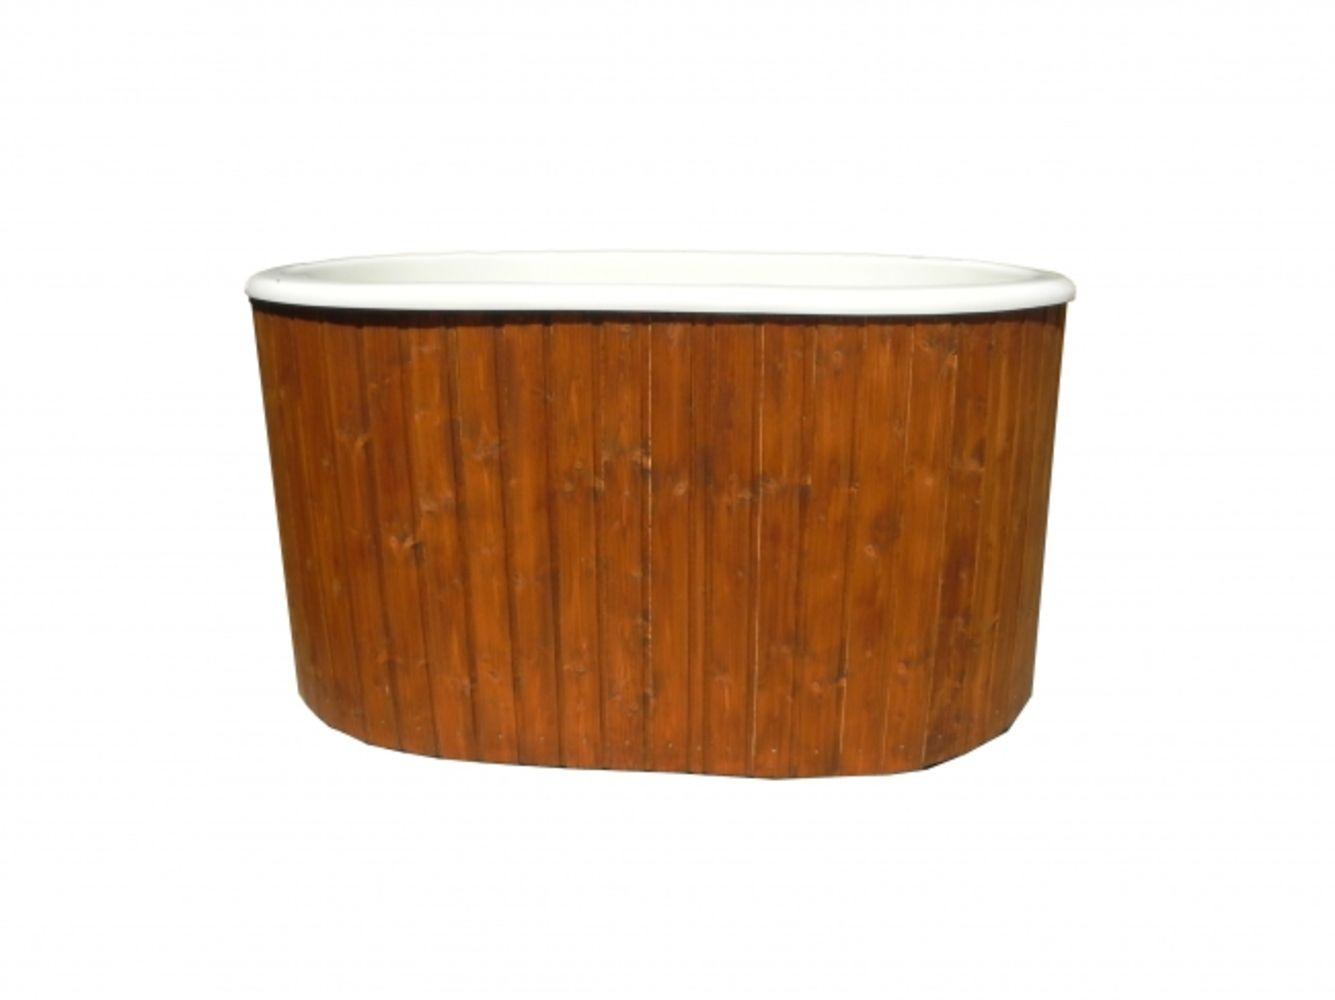 Hot Tubs, Gazebos And Rattan Furnitre